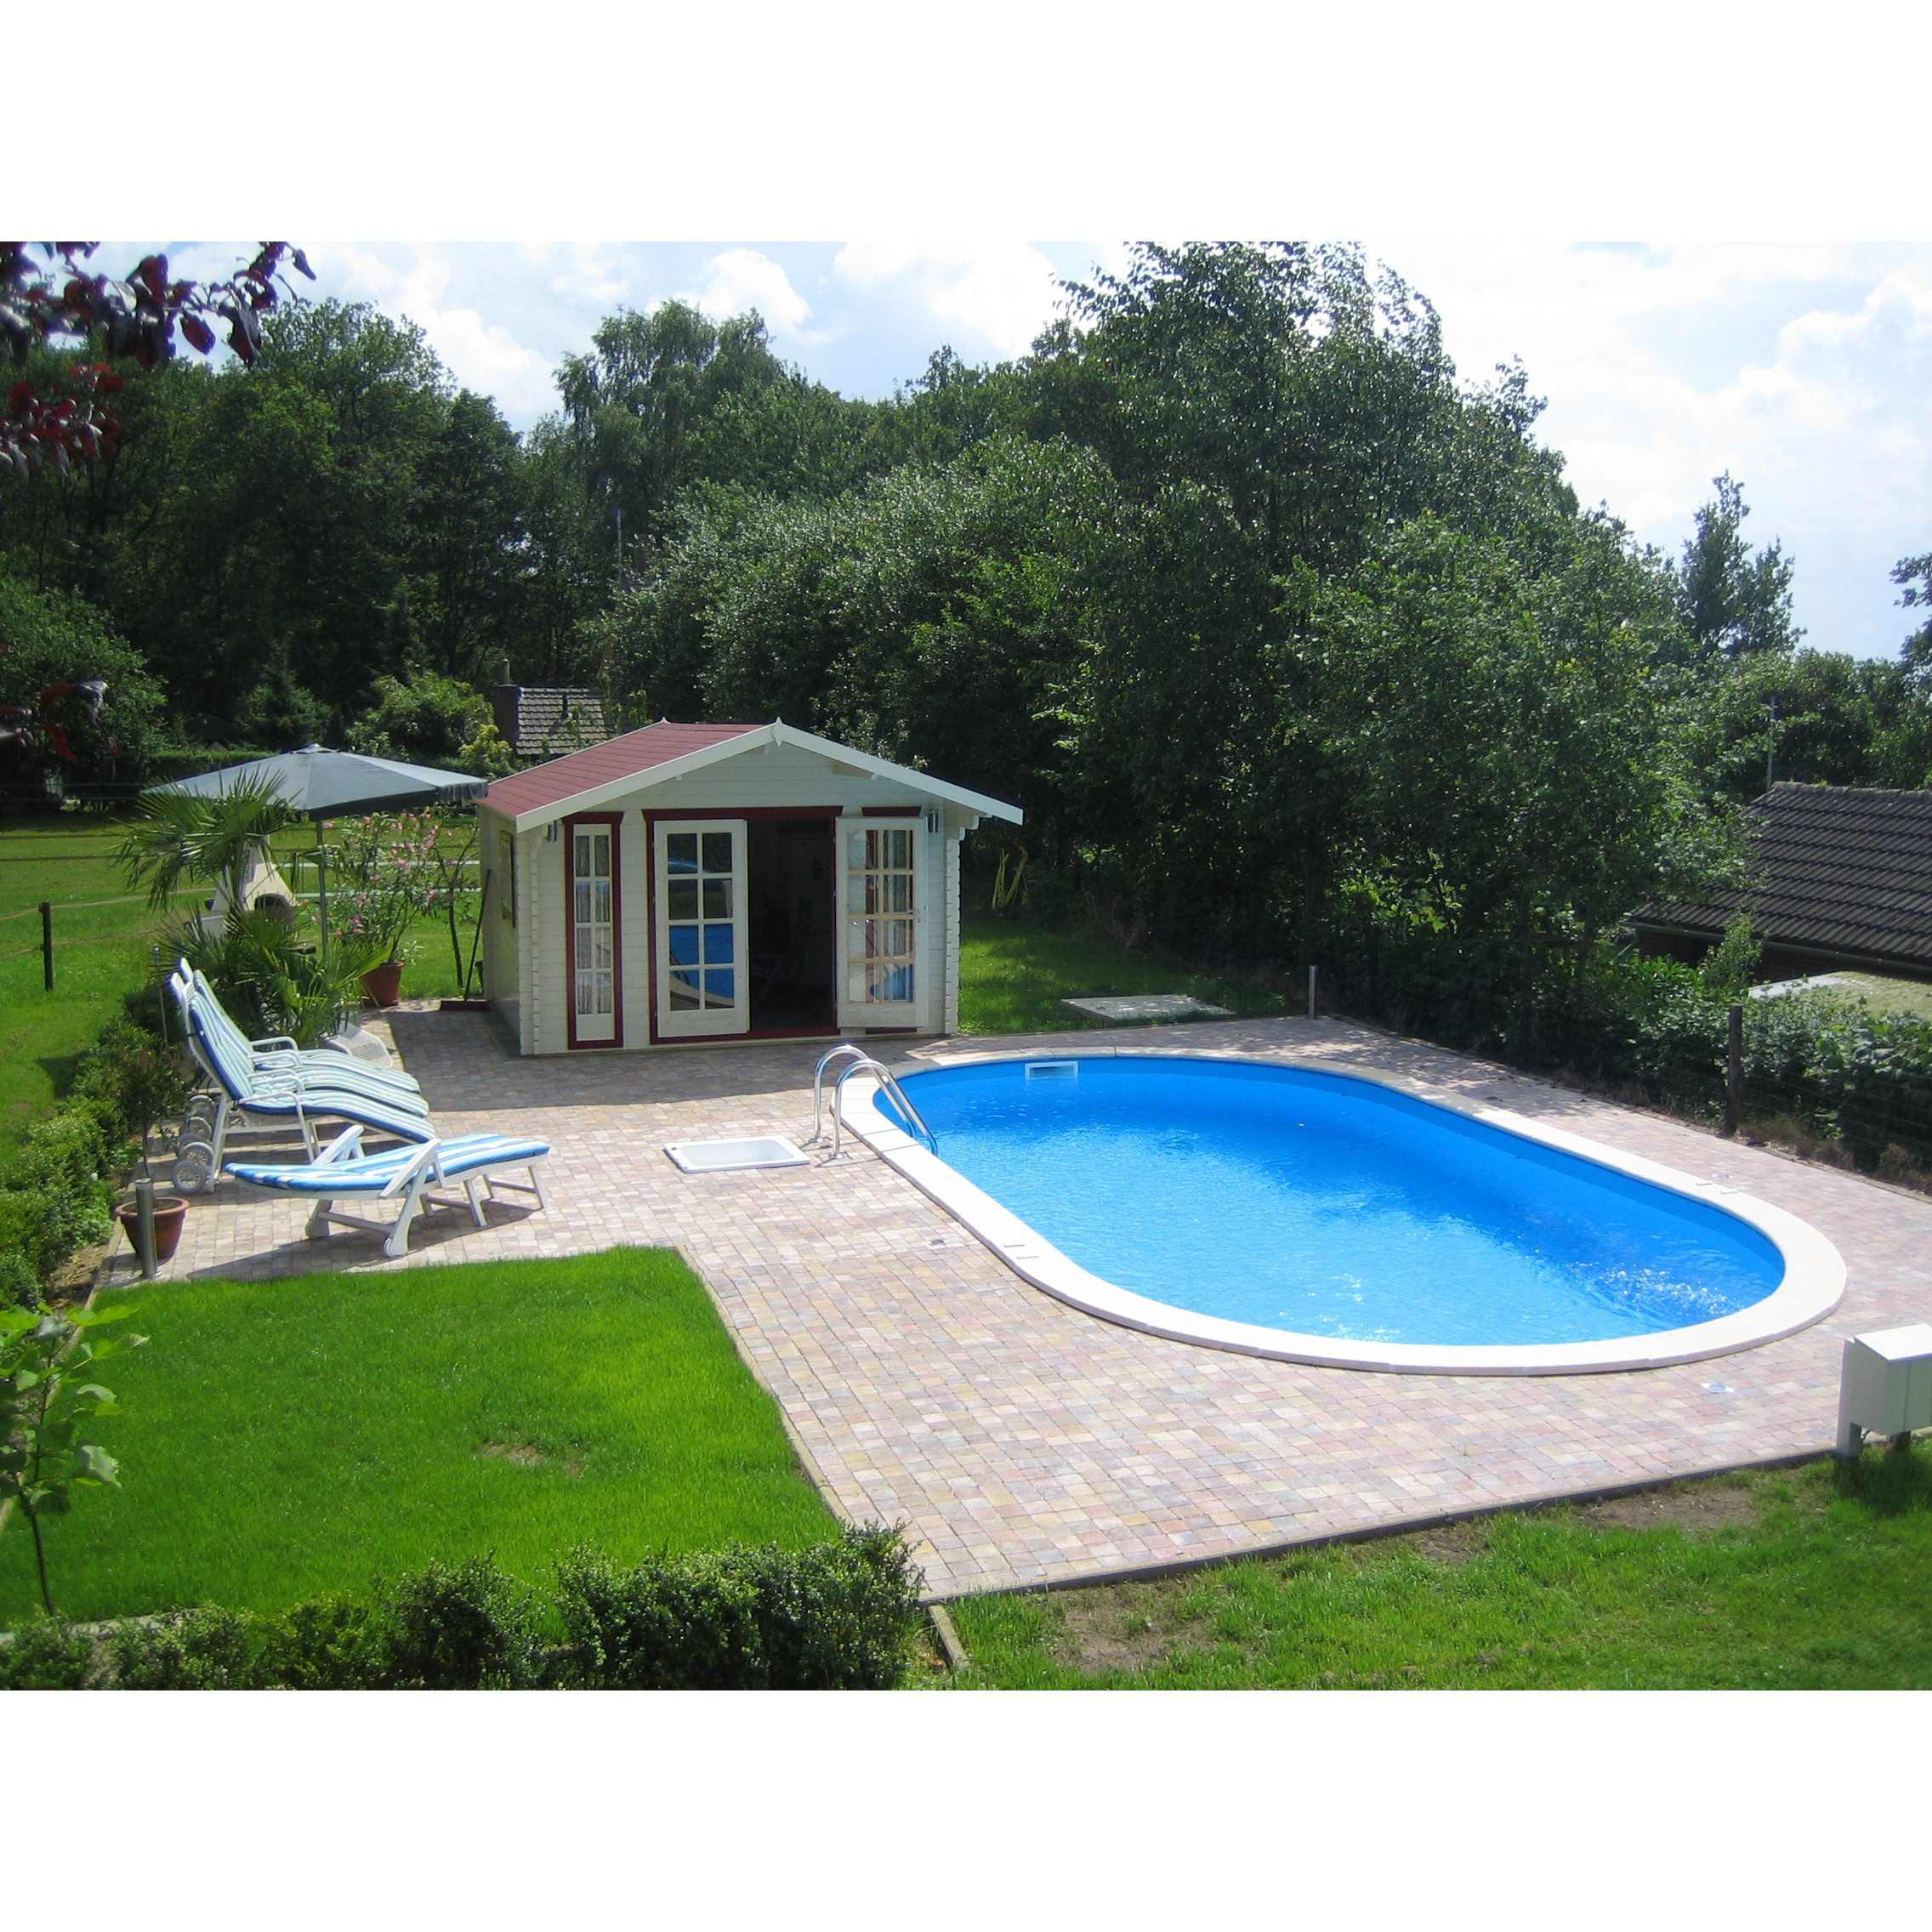 swim ovalpool 737 x 360 x 120 cm. Black Bedroom Furniture Sets. Home Design Ideas